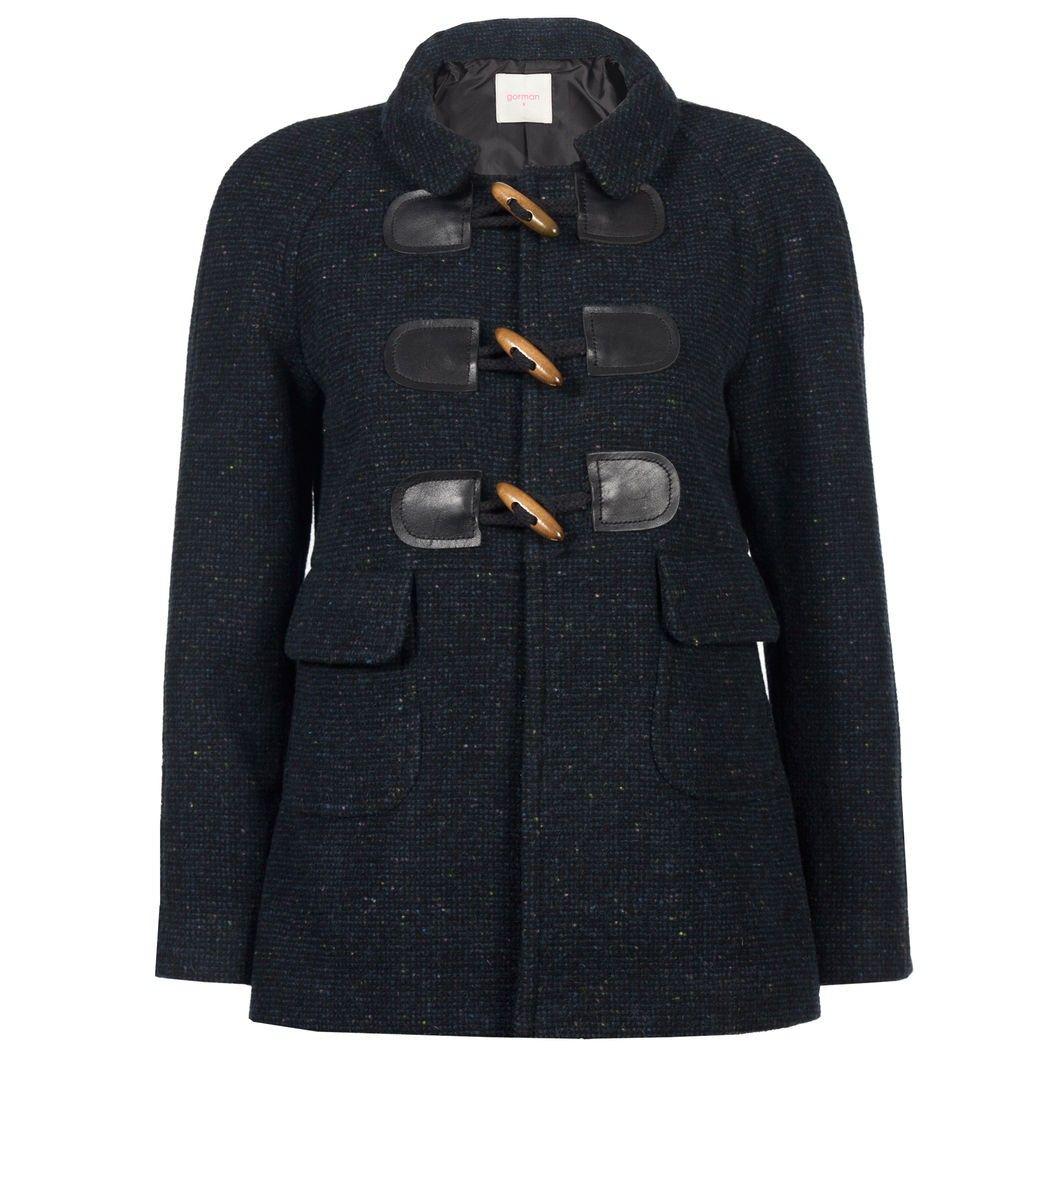 Gorman Online - Cheeky Duffle Jacket | My Style | Pinterest ...